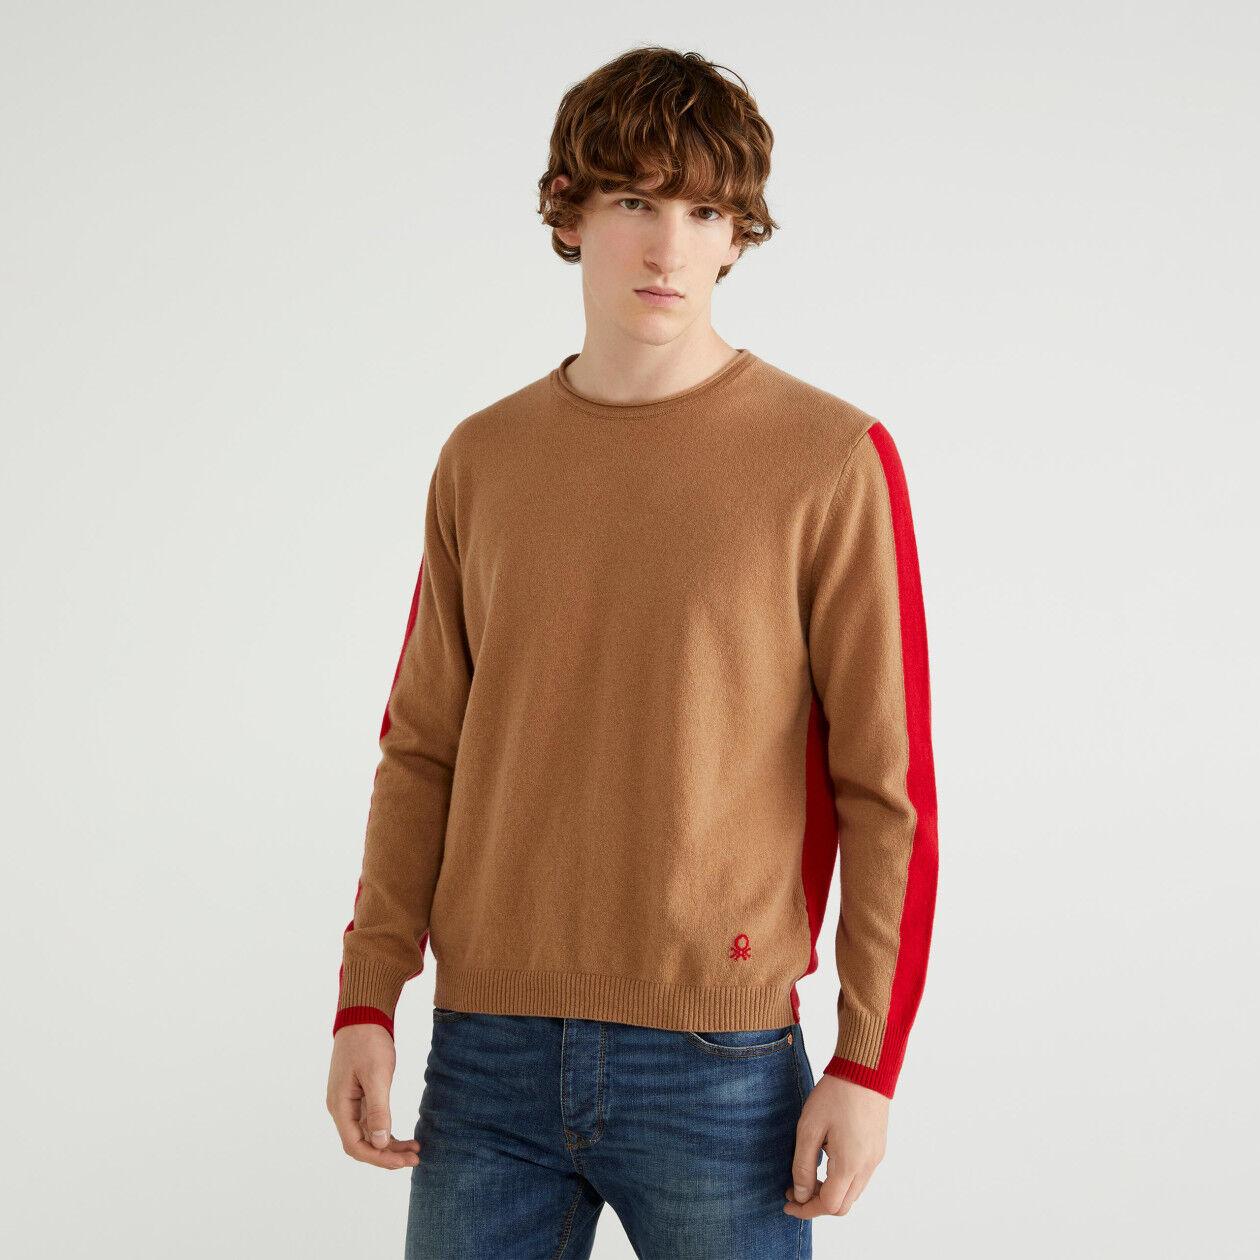 Two-tone sweater